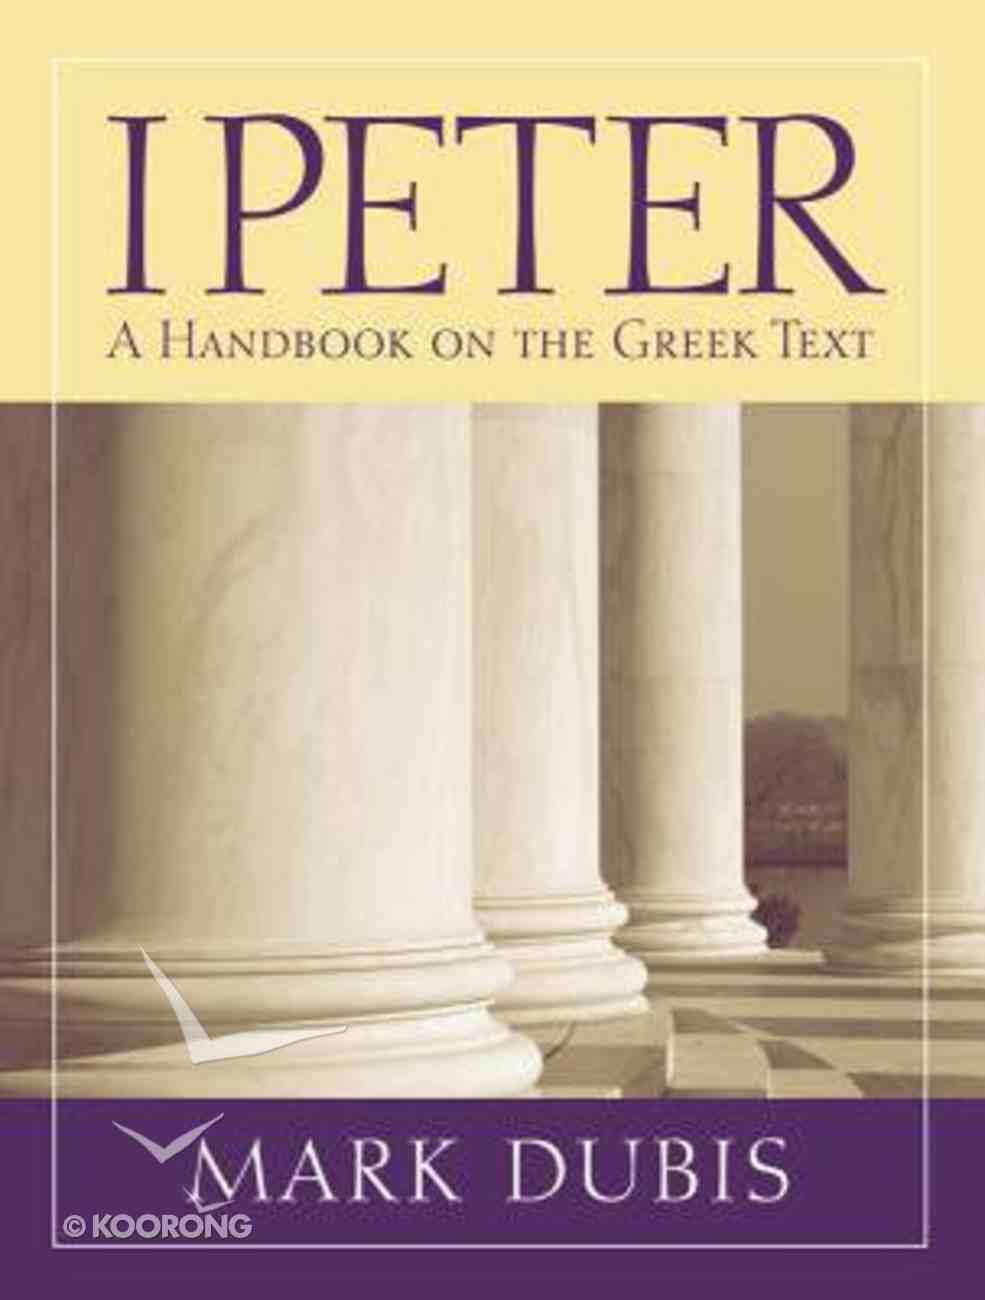 1 Peter: A Handbook on the Greek Text (Baylor Handbook On The Greek New Testament Series) Paperback